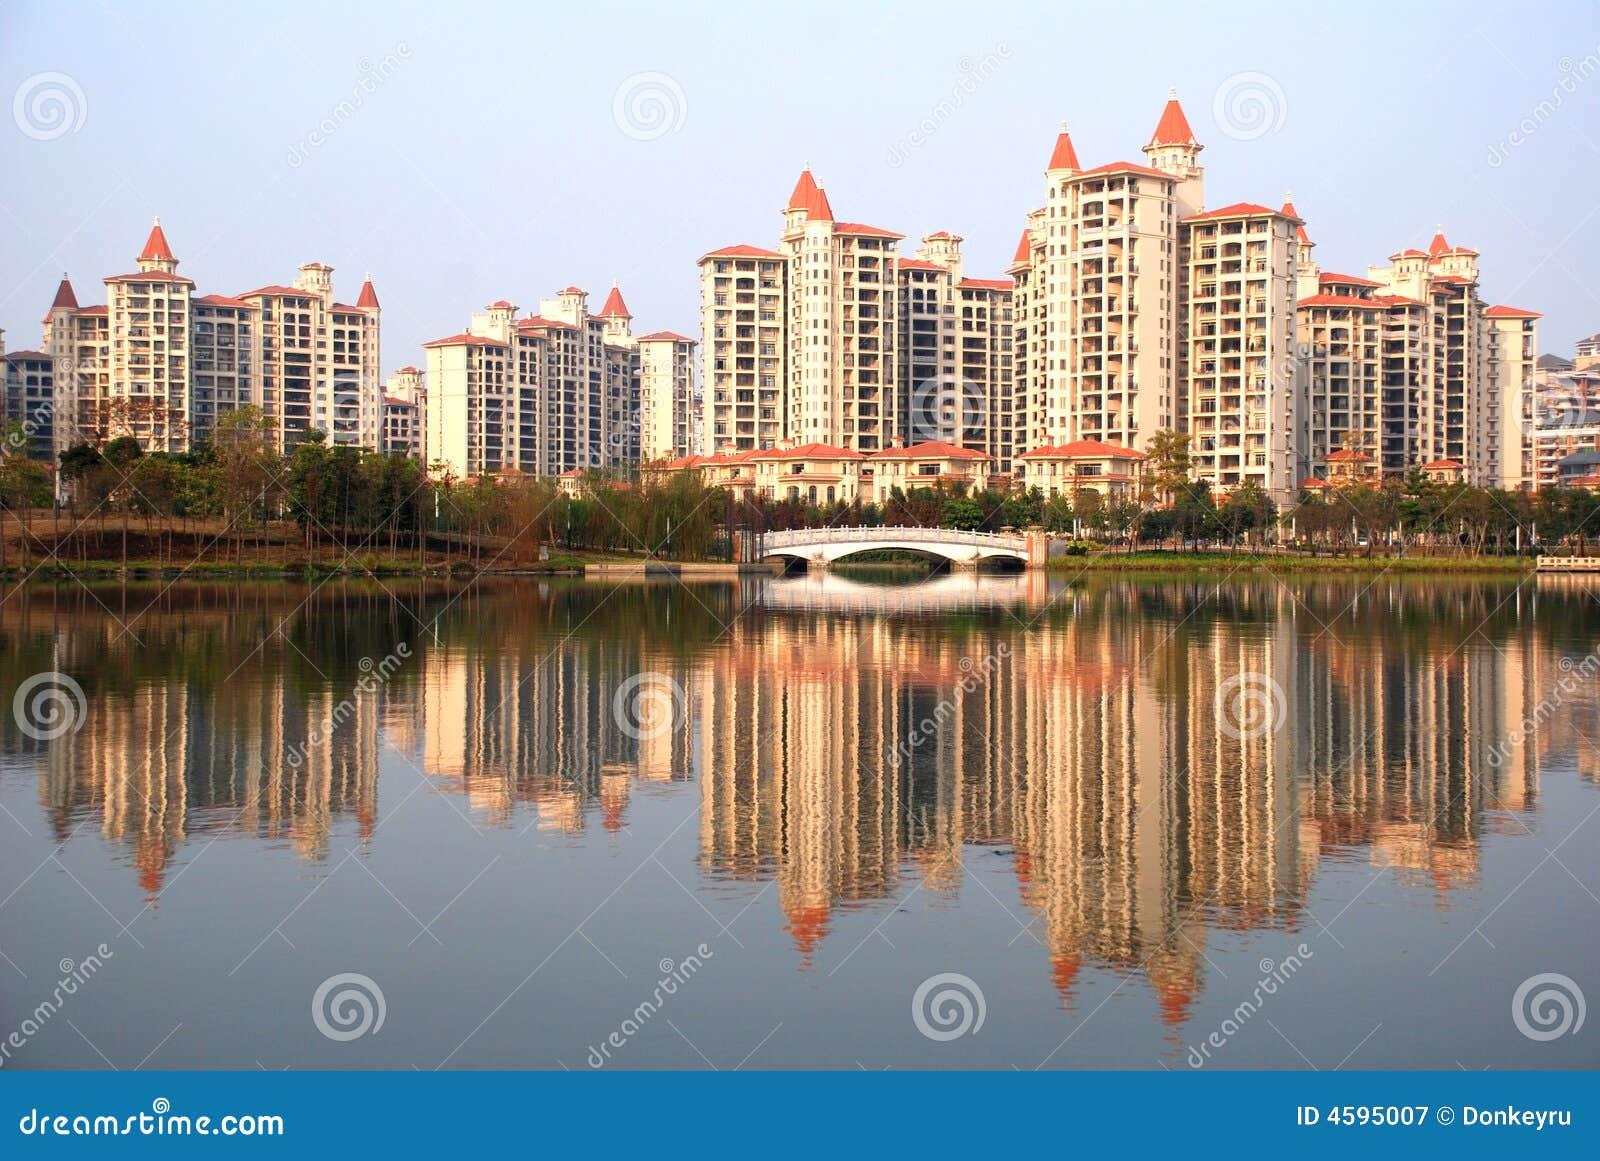 Blok mieszkalny lakeside